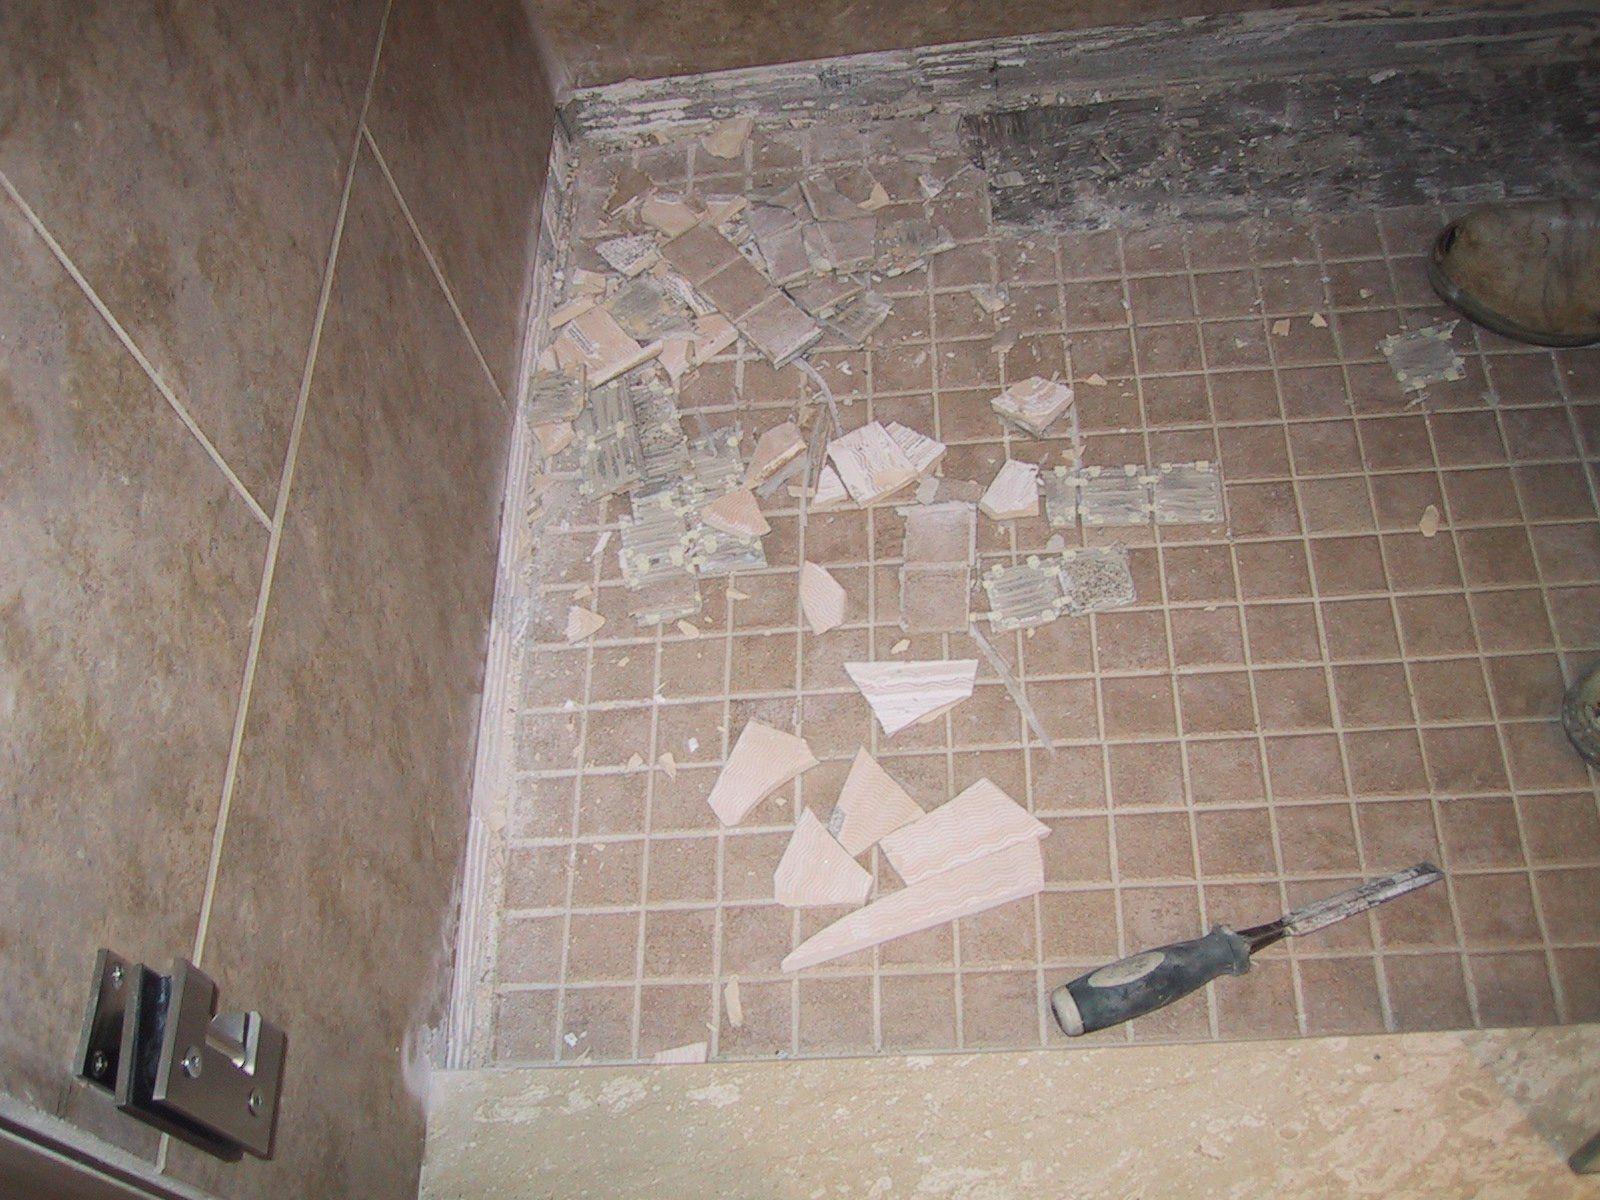 Best Of Do I Tile Shower Walls Or Floor First And Description In 2020 Shower Floor Shower Tile Shower Wall Tile